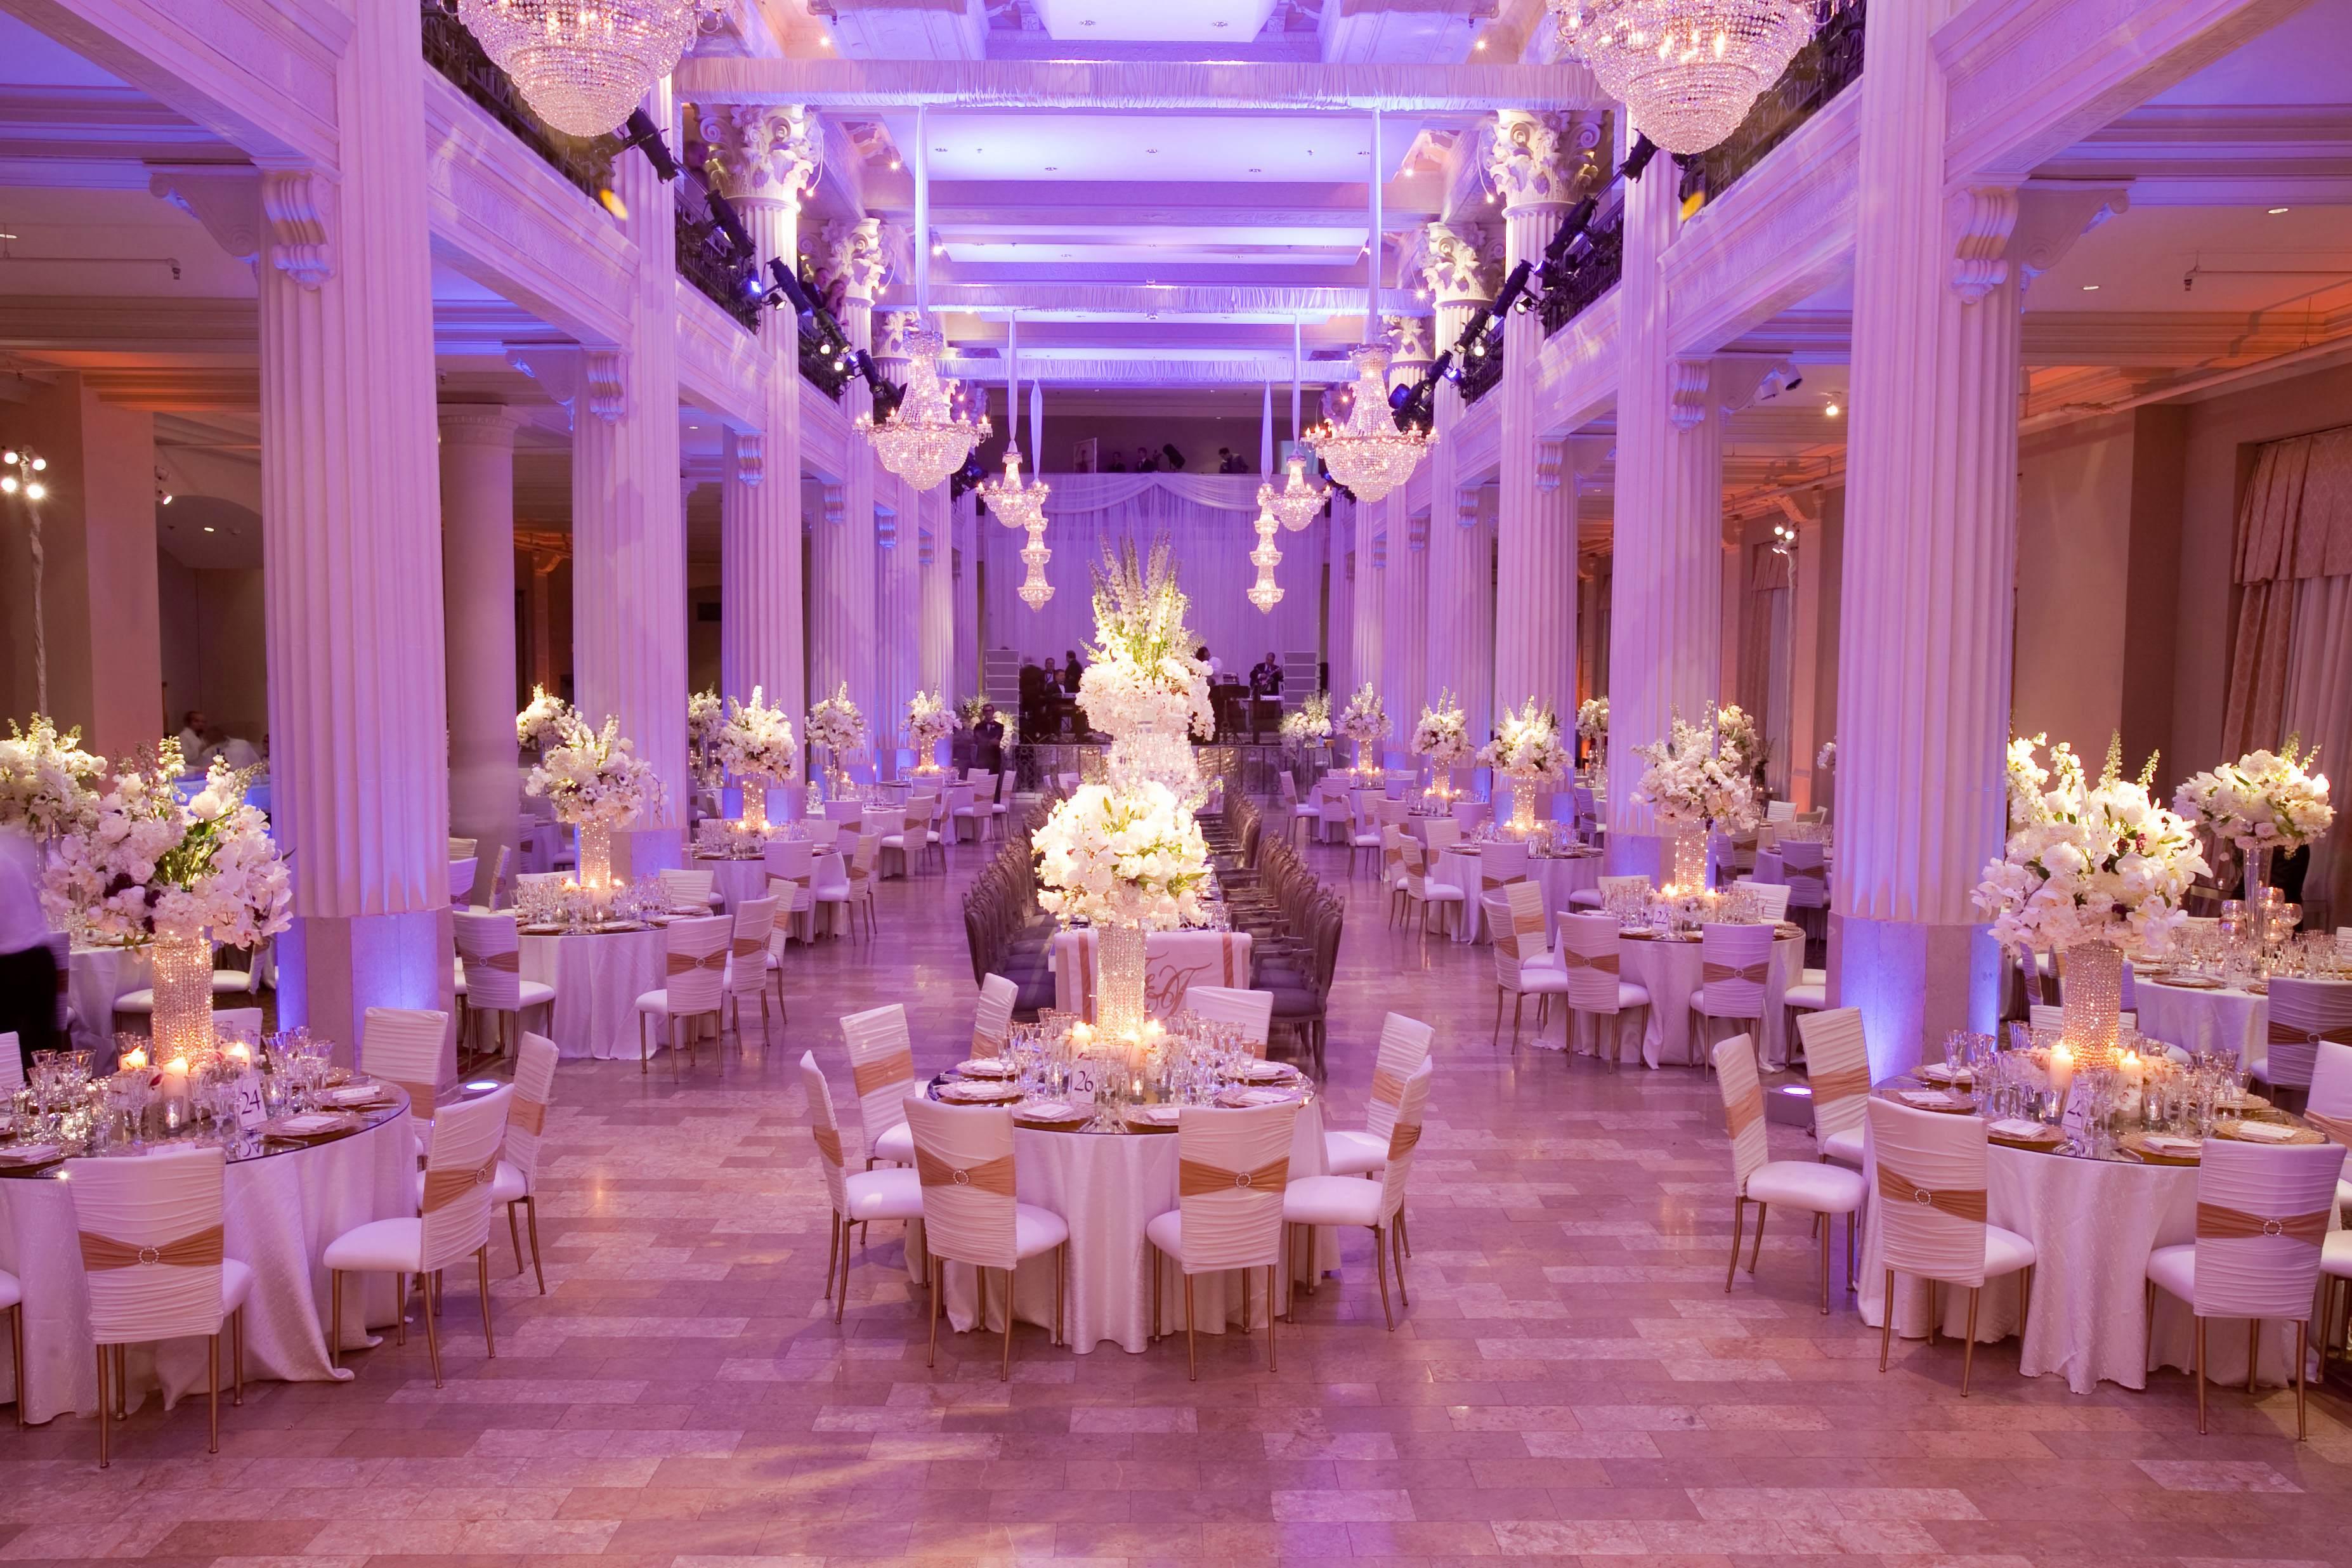 Purple lighting at ballroom wedding reception with columns